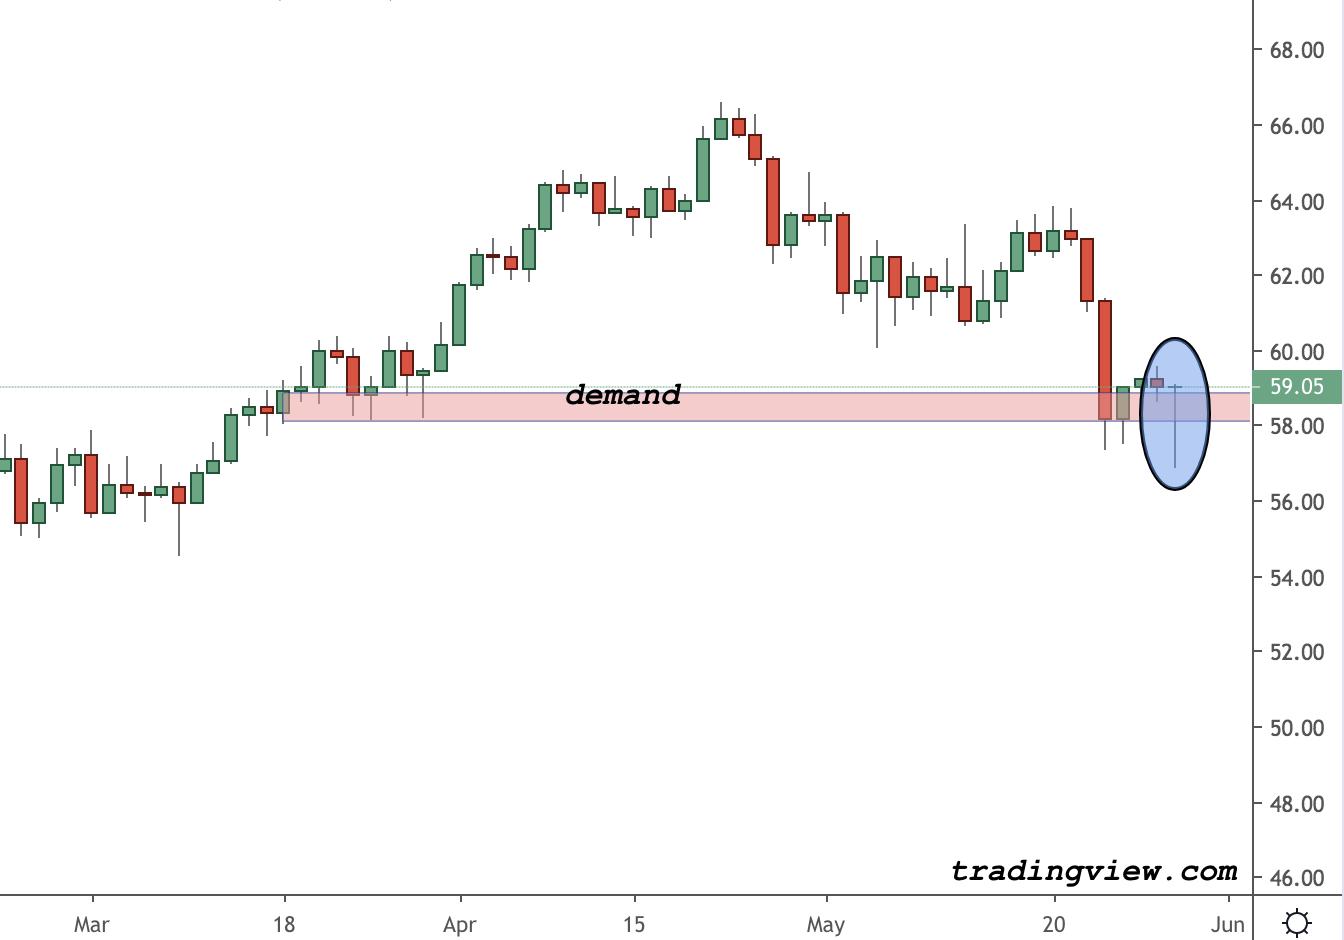 Crude Oil Trading Analysis